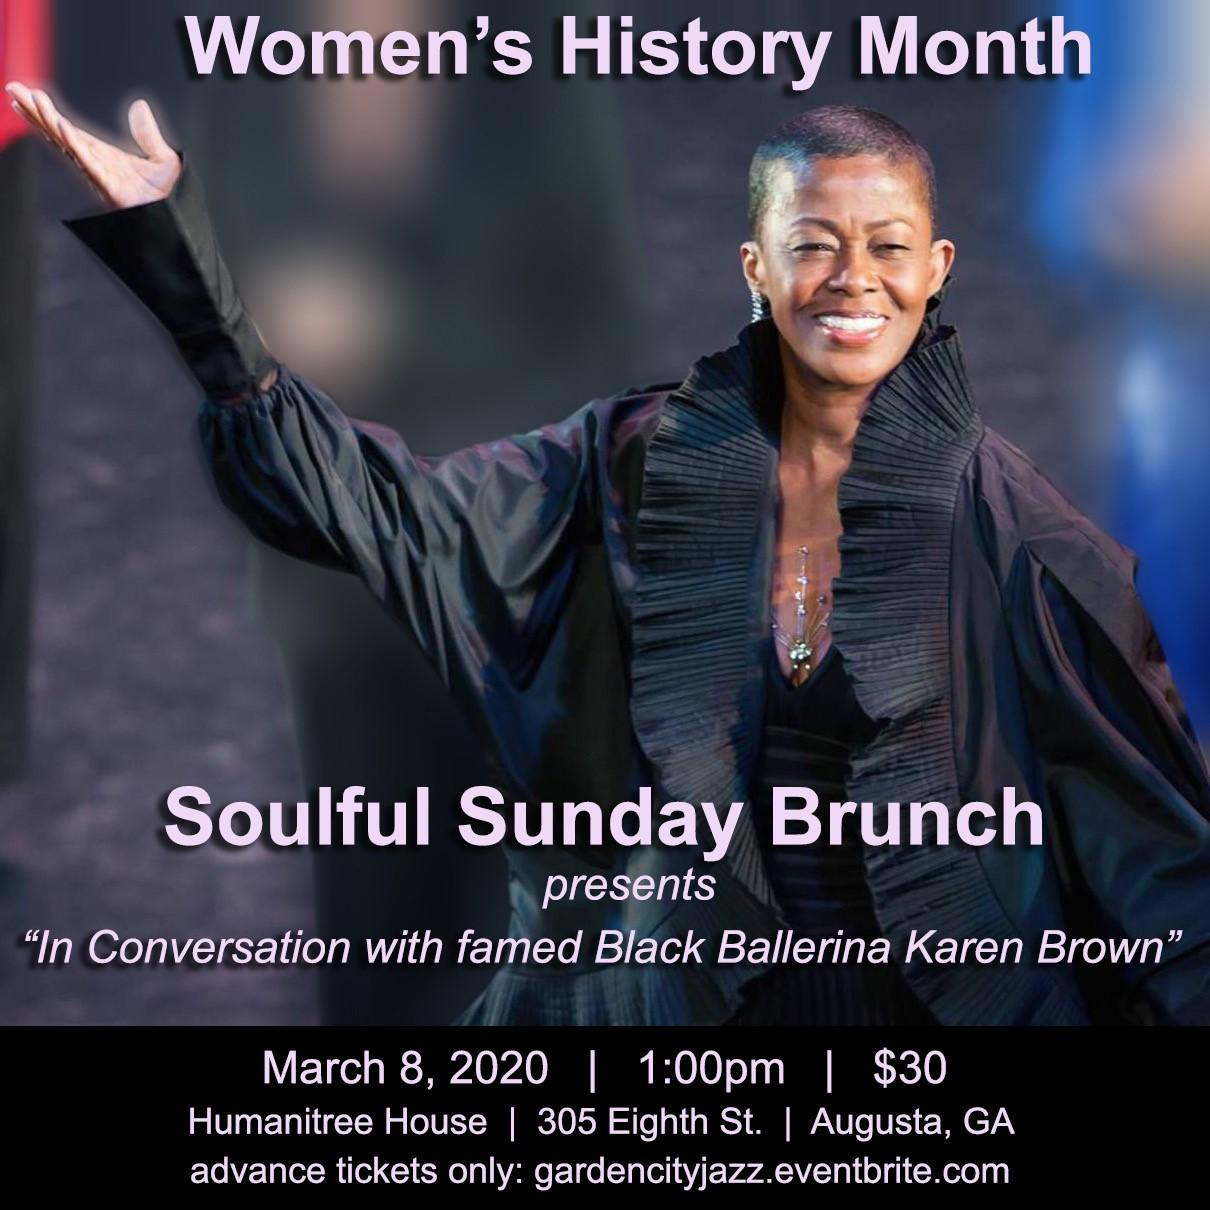 Karen Brown Soulful Sunday Brunch poster